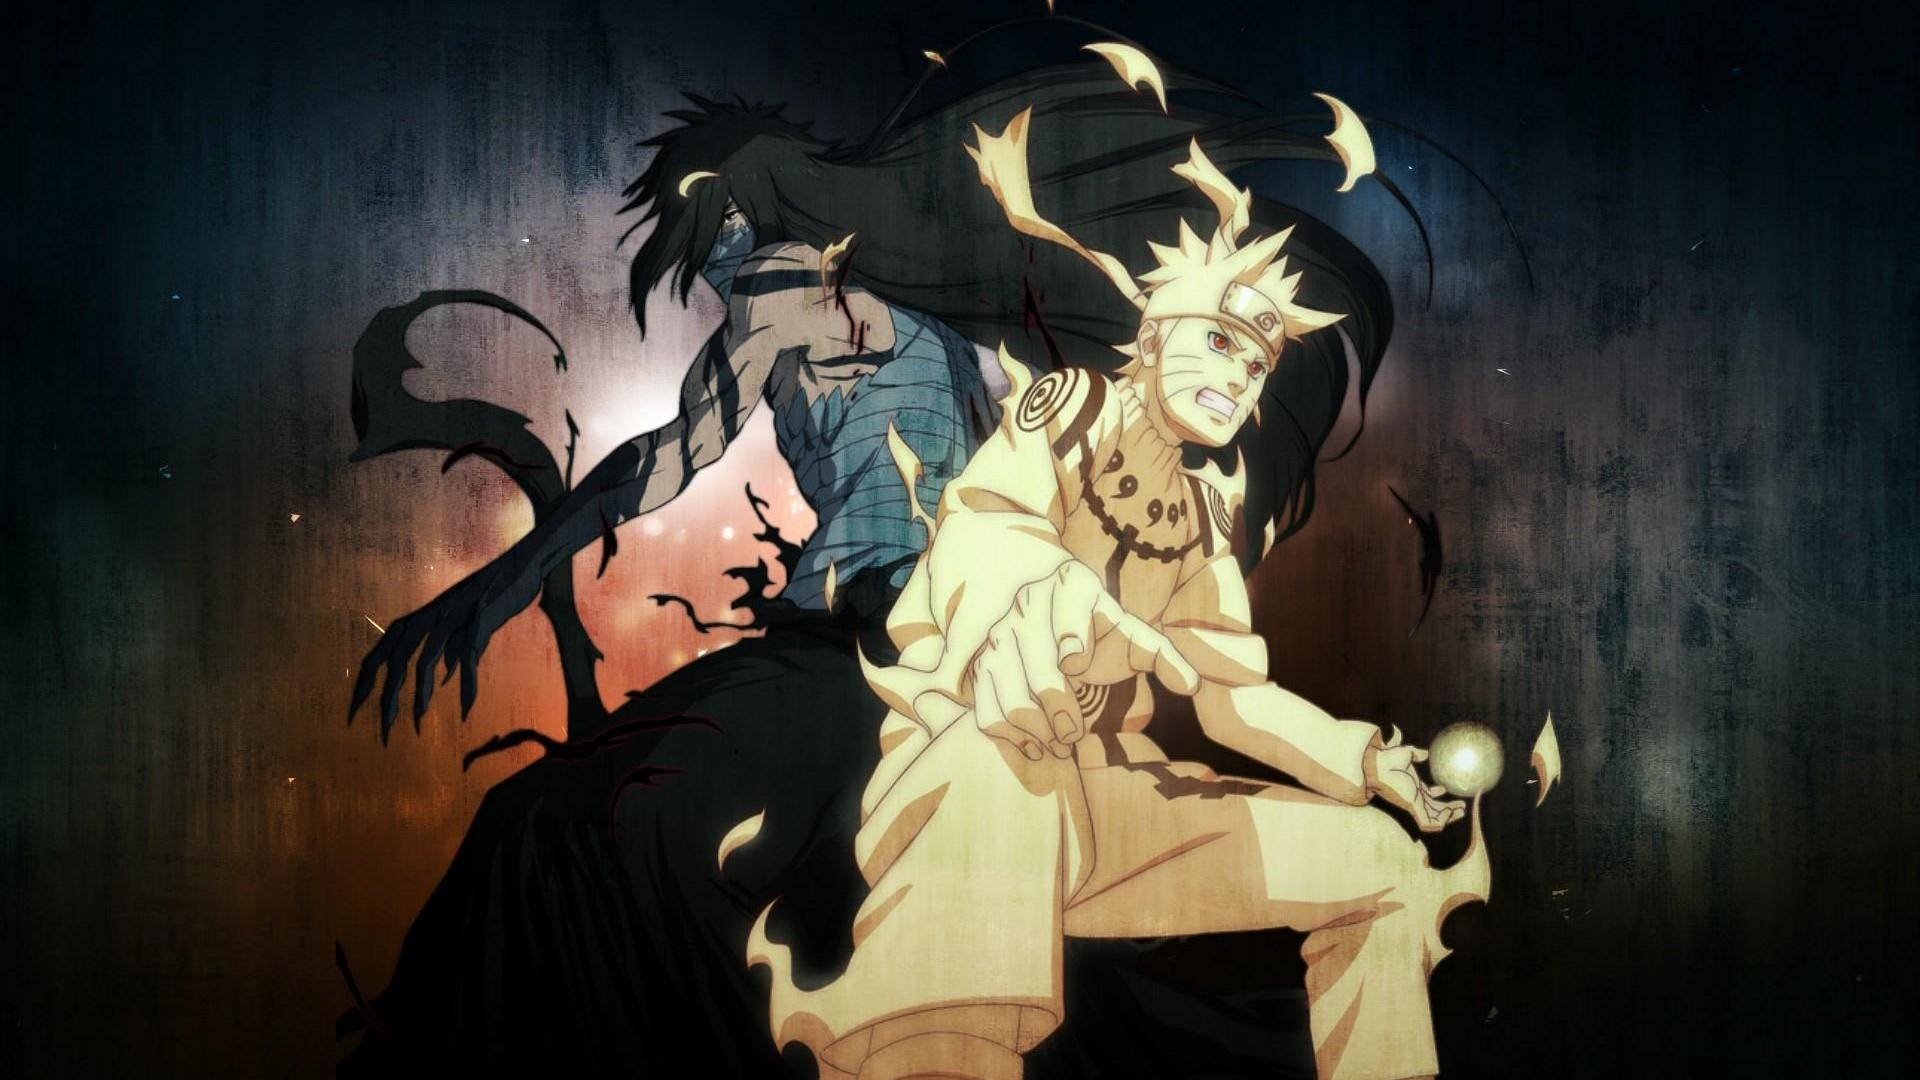 Top Wallpaper Naruto Shippuden - 942526-top-naruto-shippuden-hd-wallpaper-1920x1080  Photograph.jpg